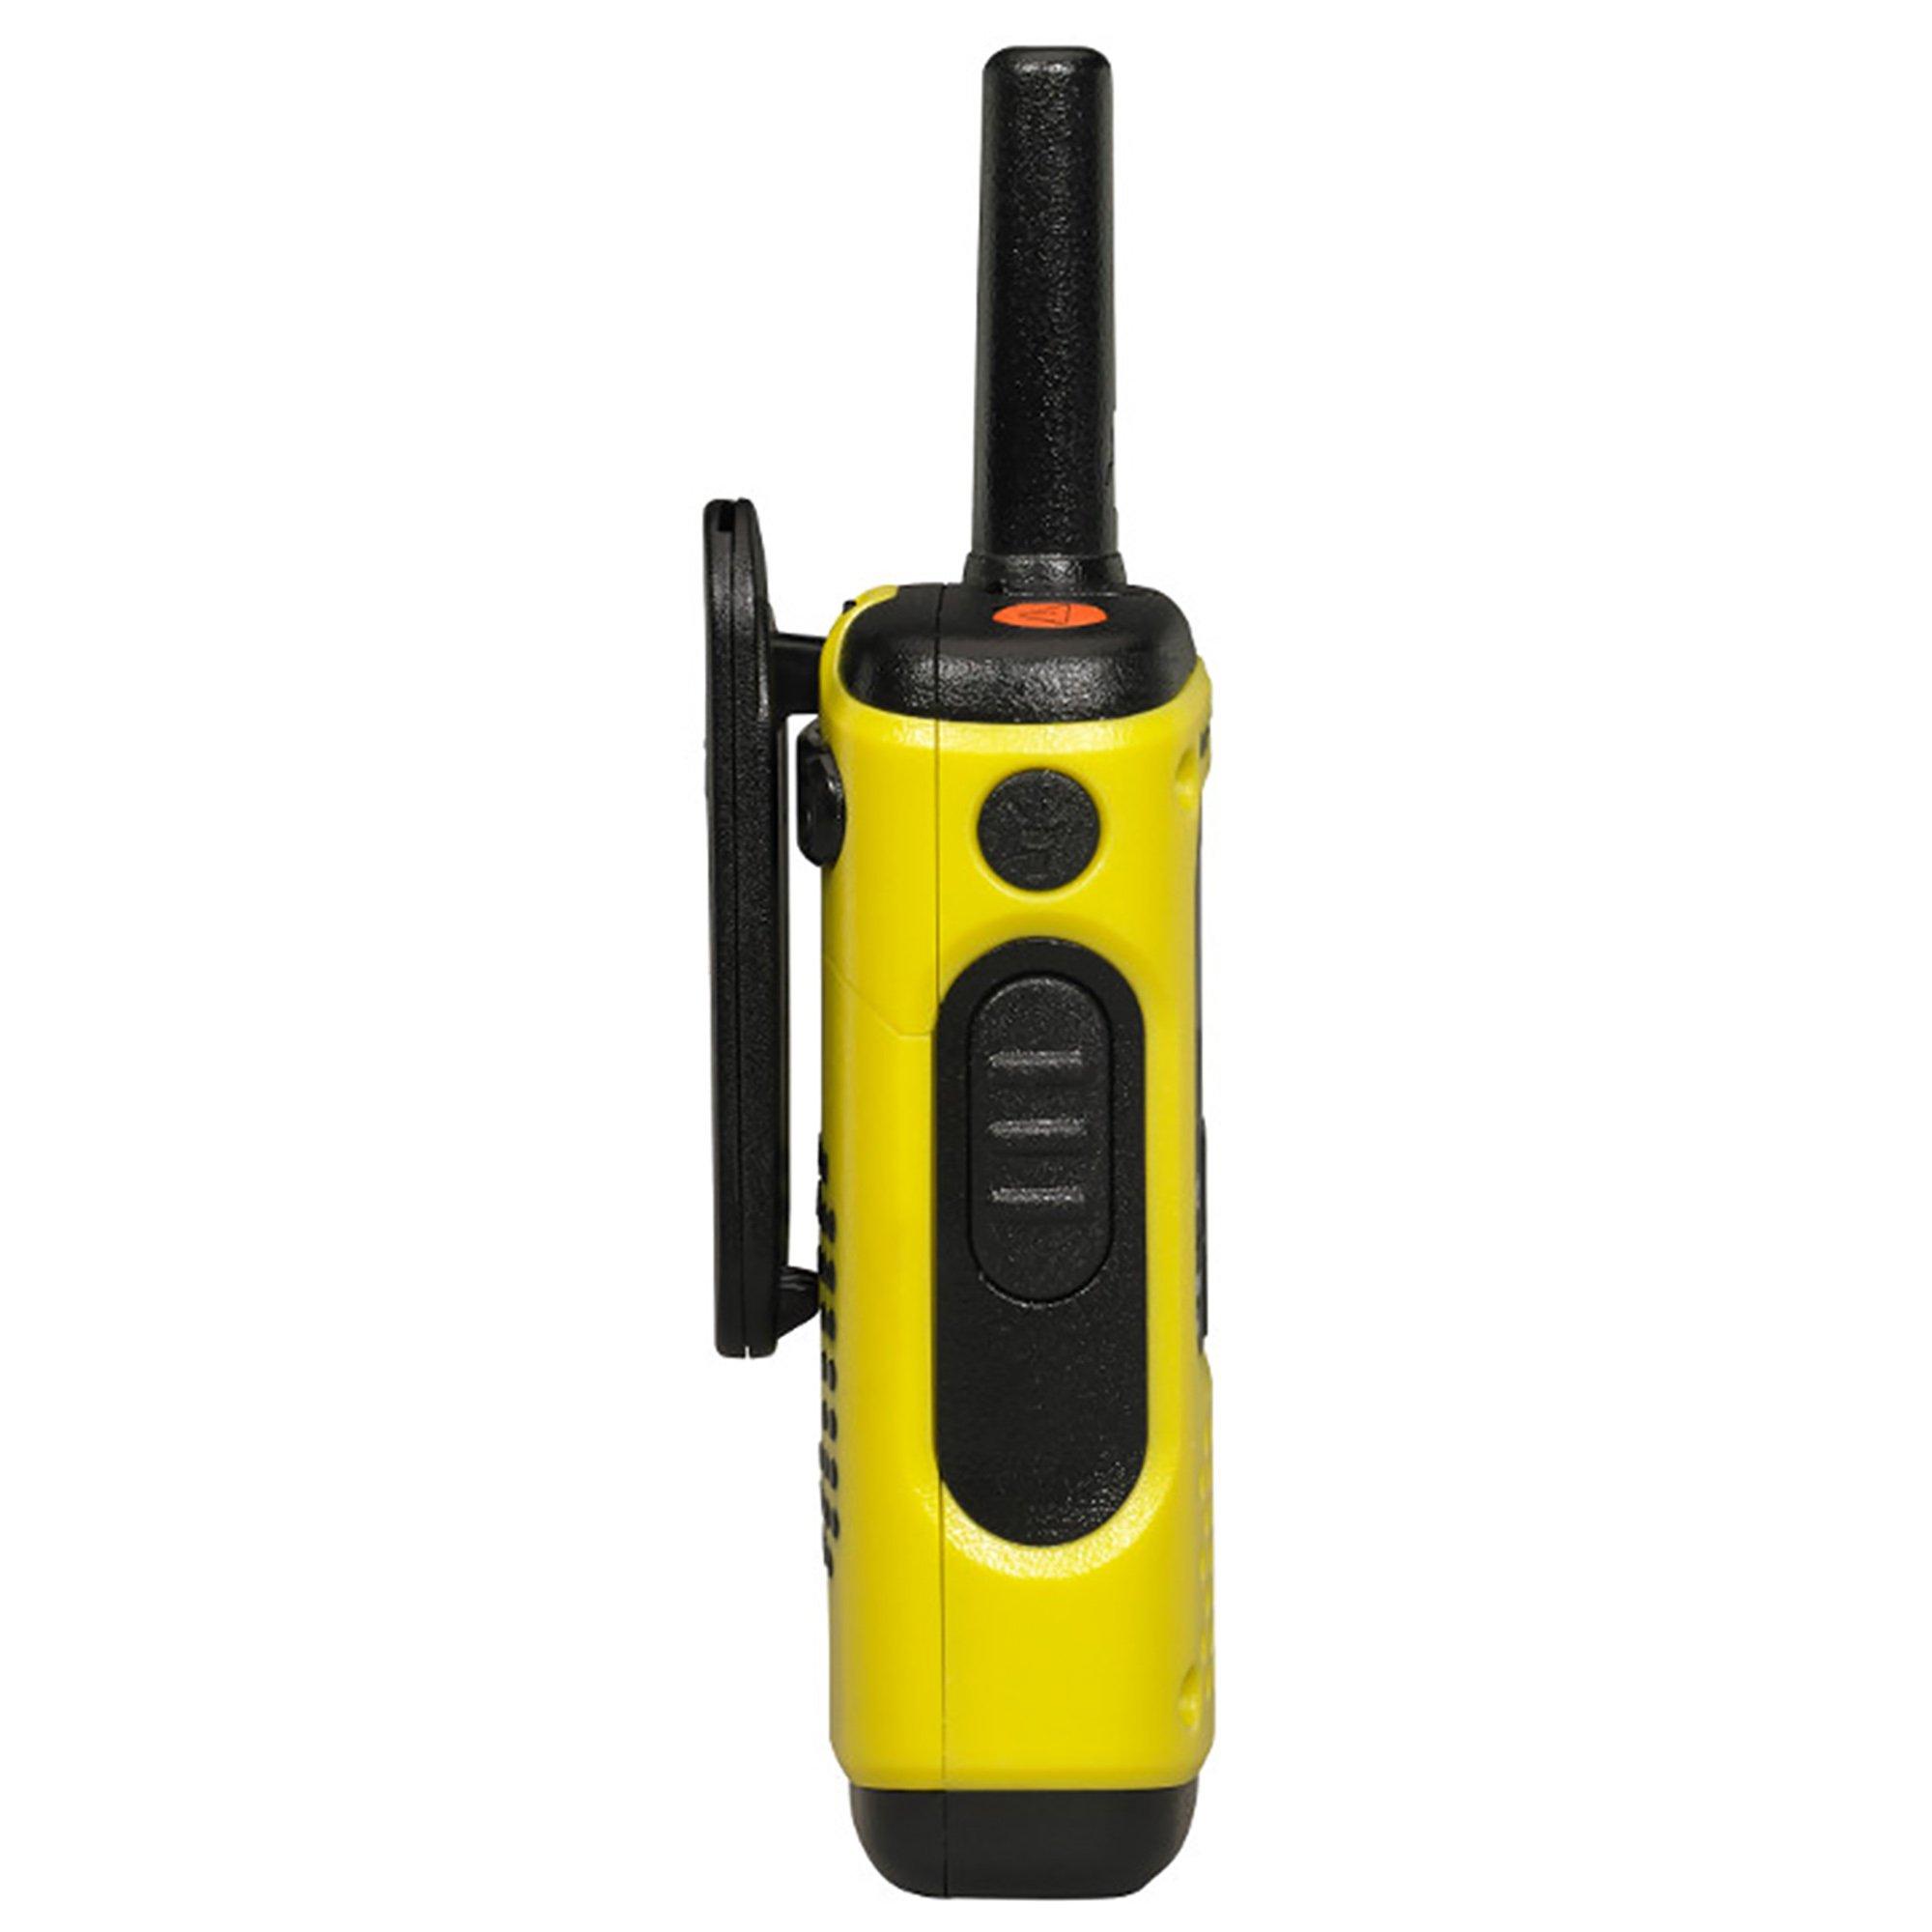 Motorola Talkabout Radio T631 by Motorola Solutions (Image #4)